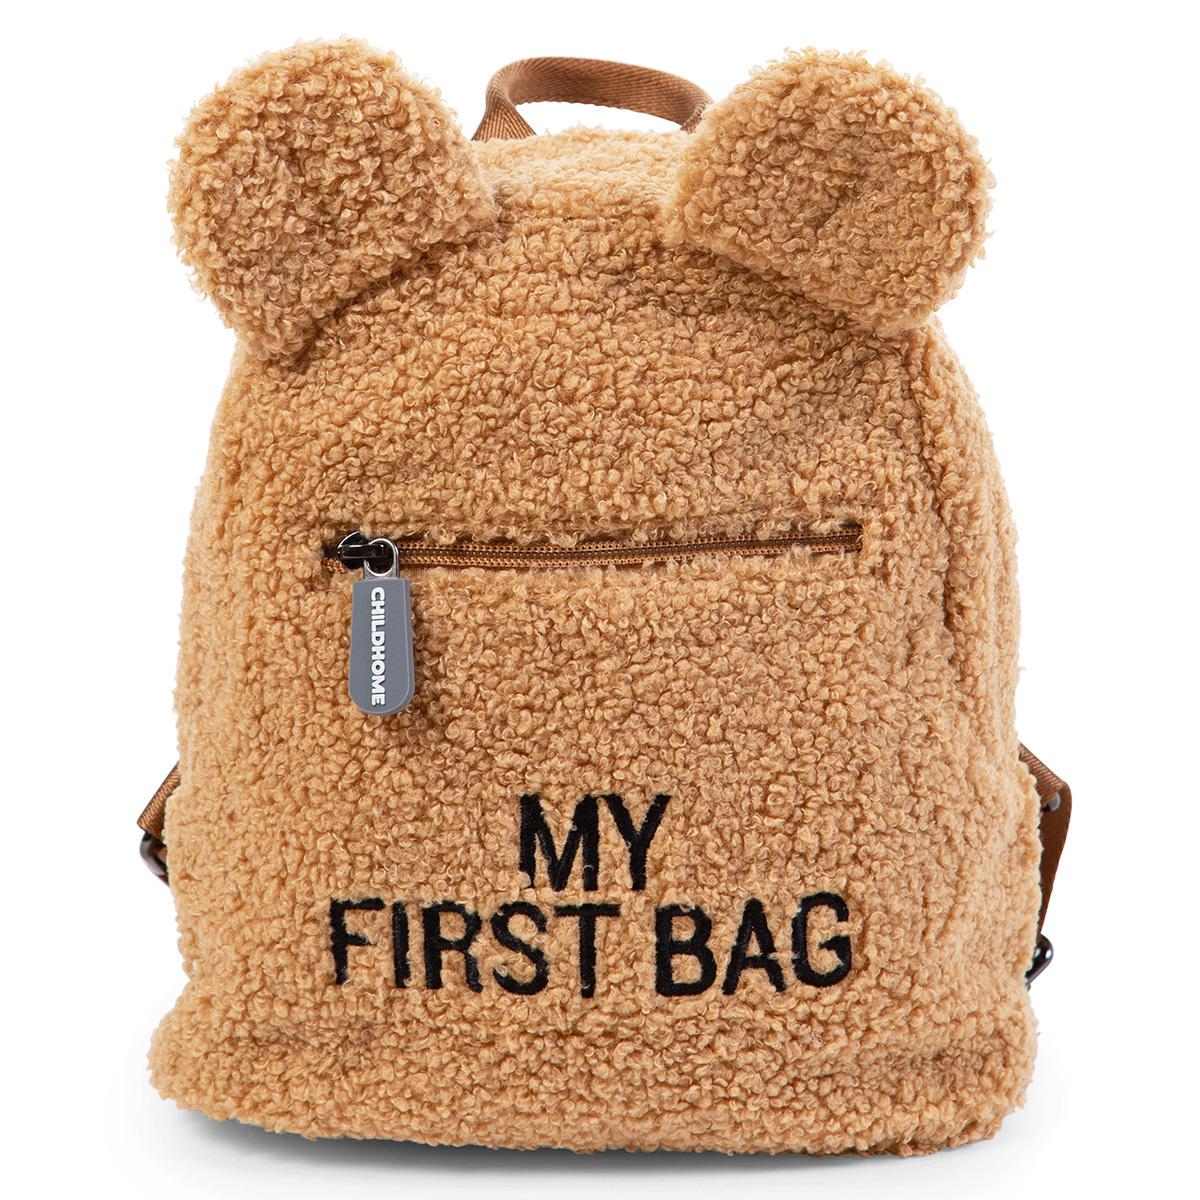 Bagagerie enfant Sac à Dos My First Bag - Teddy Beige Sac à Dos My First Bag - Teddy Beige